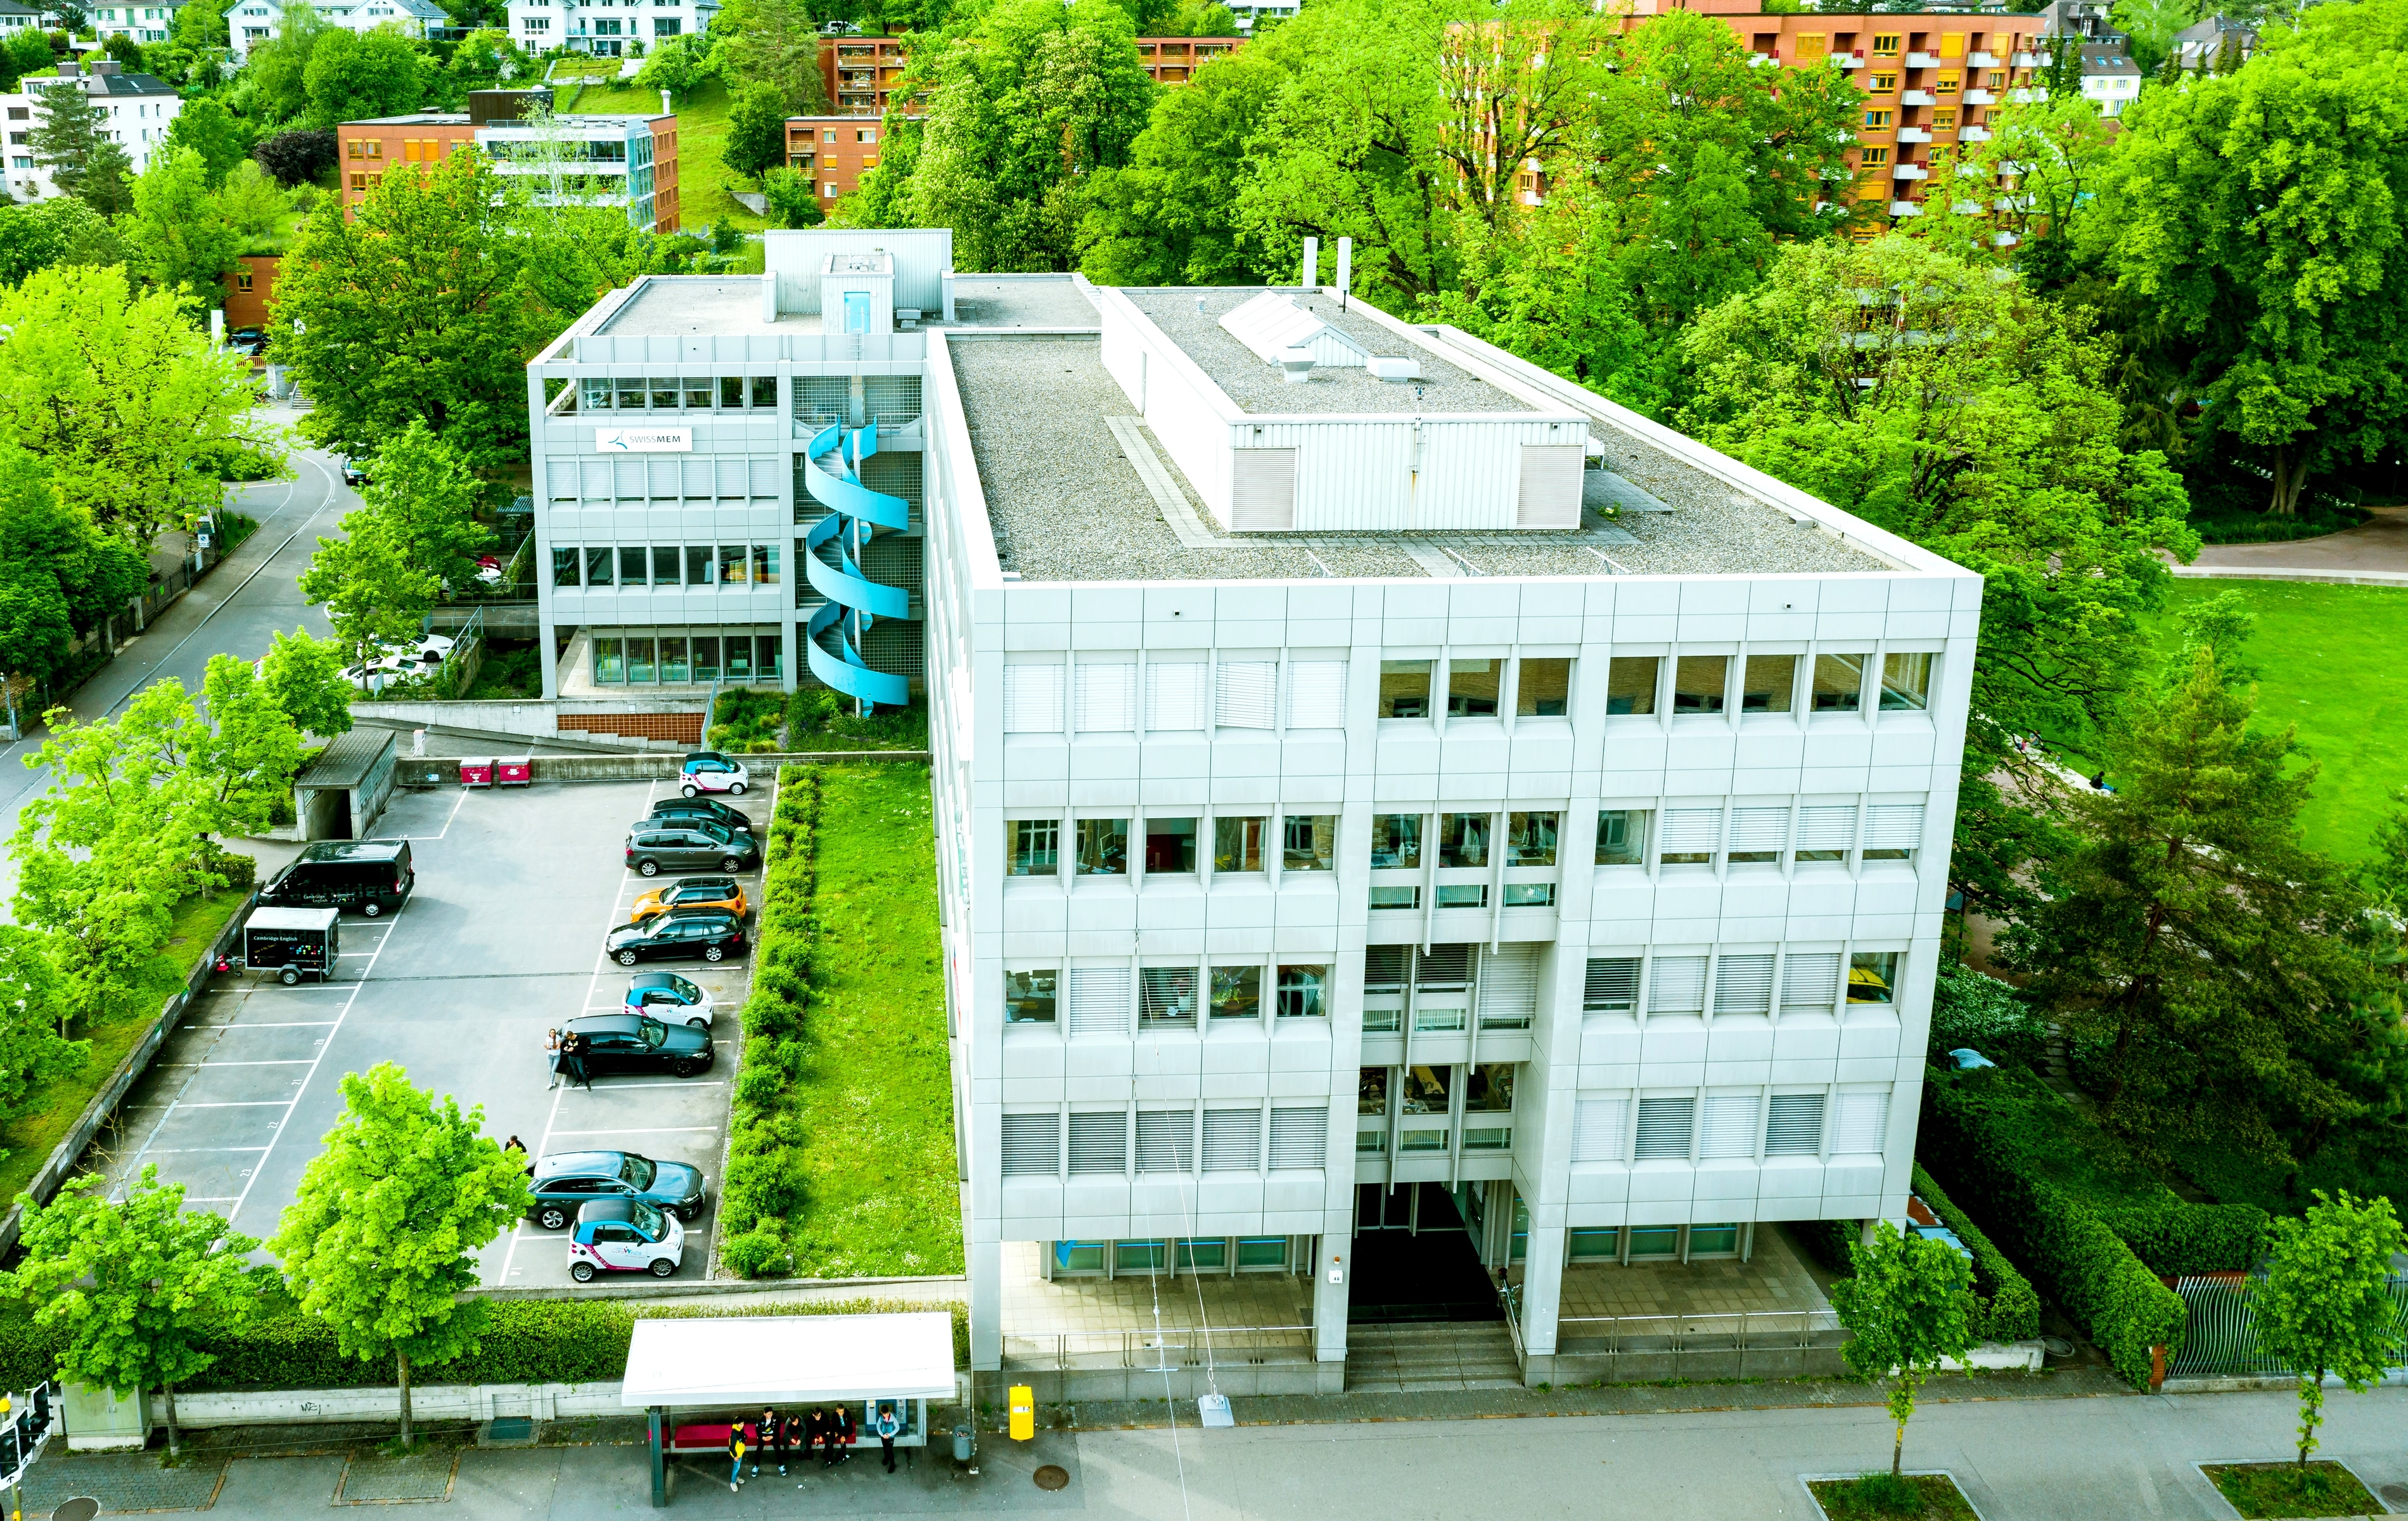 Neues Firmengebäude / neuer Standort / Adato AG